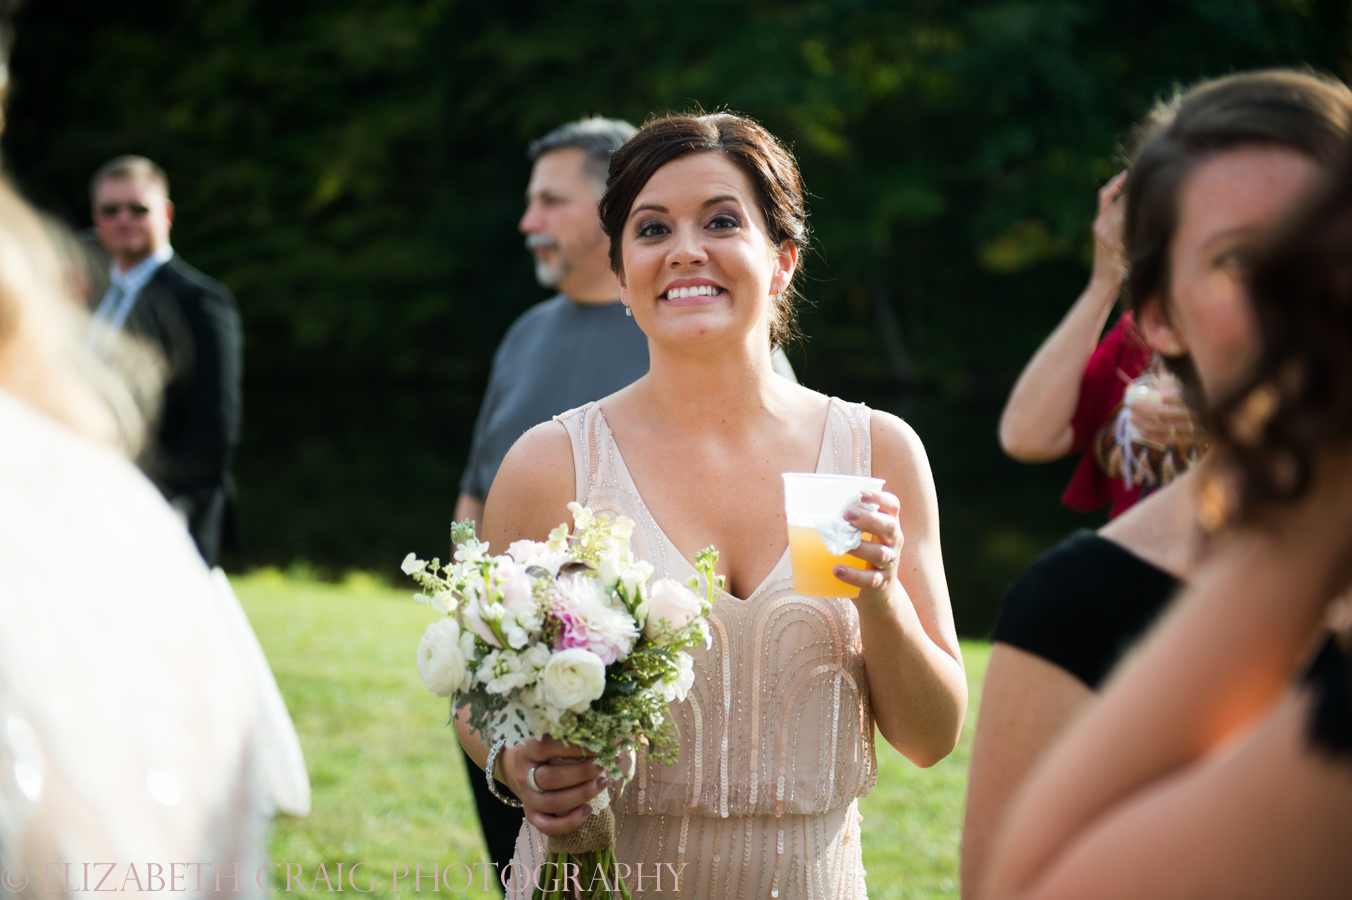 Dubois Brockway St. Marys PA Weddings-0185